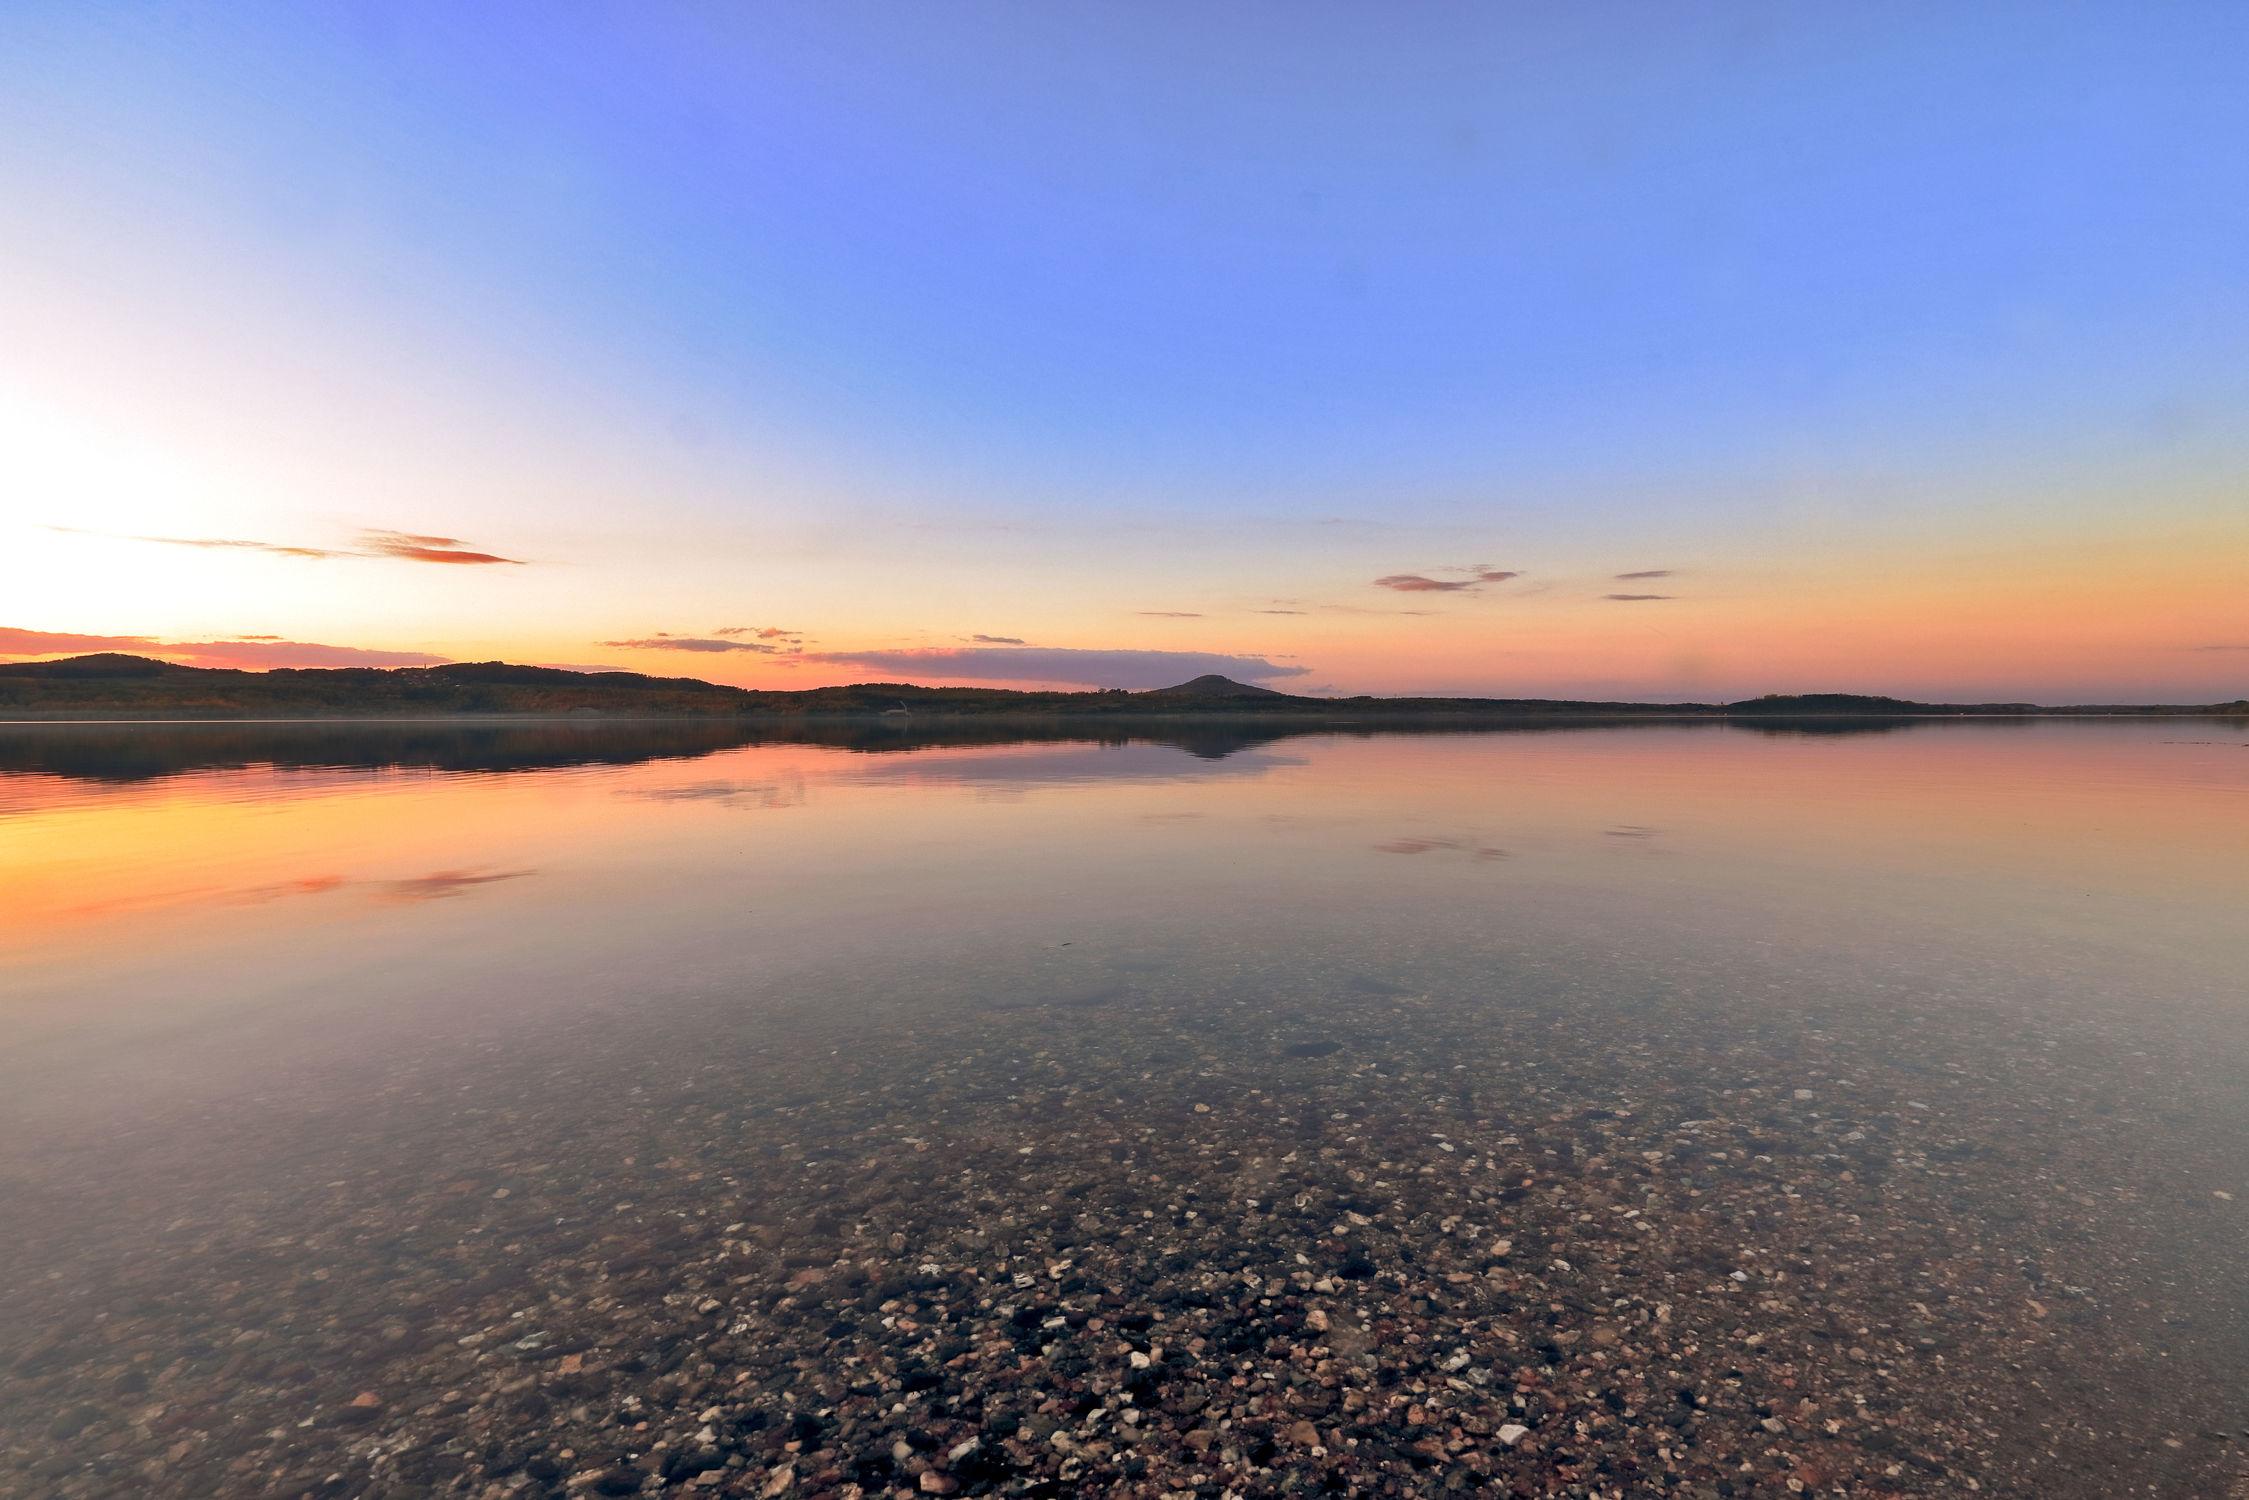 Bild mit Natur, Sonnenuntergang, Sonnenaufgang, Panorama, Landschaft, Sunset, Seeblick, See, Berzdorfer See, Landeskrone, Landschaftspanorama, Sachsen